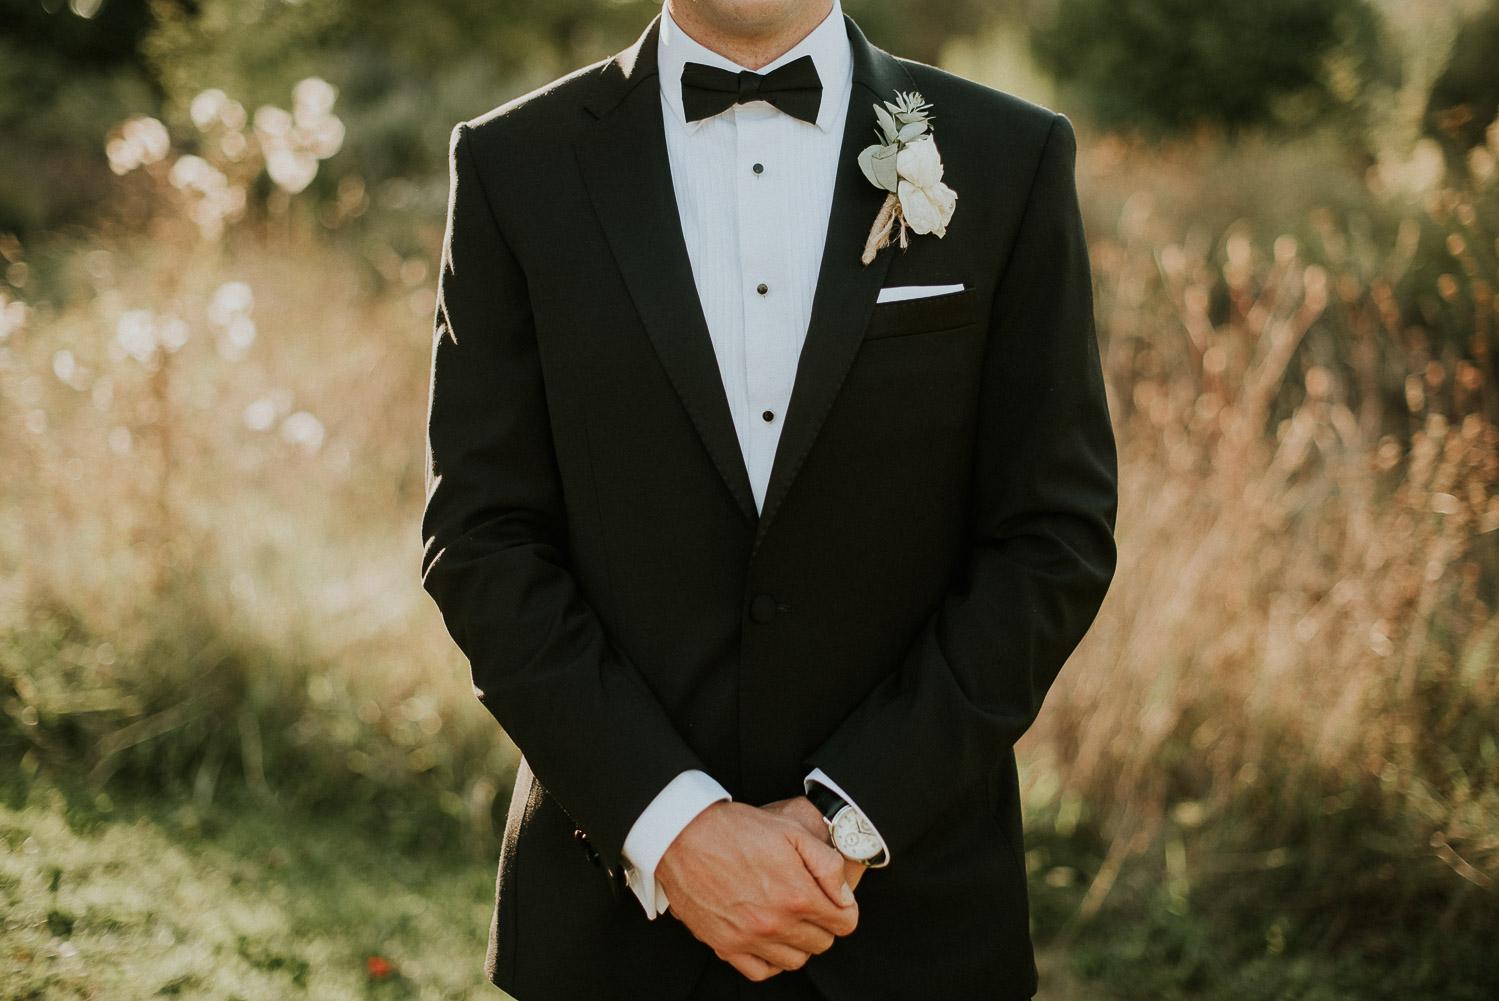 dordogne_eymet_wedding_france_katy_webb_photography_france_UK102